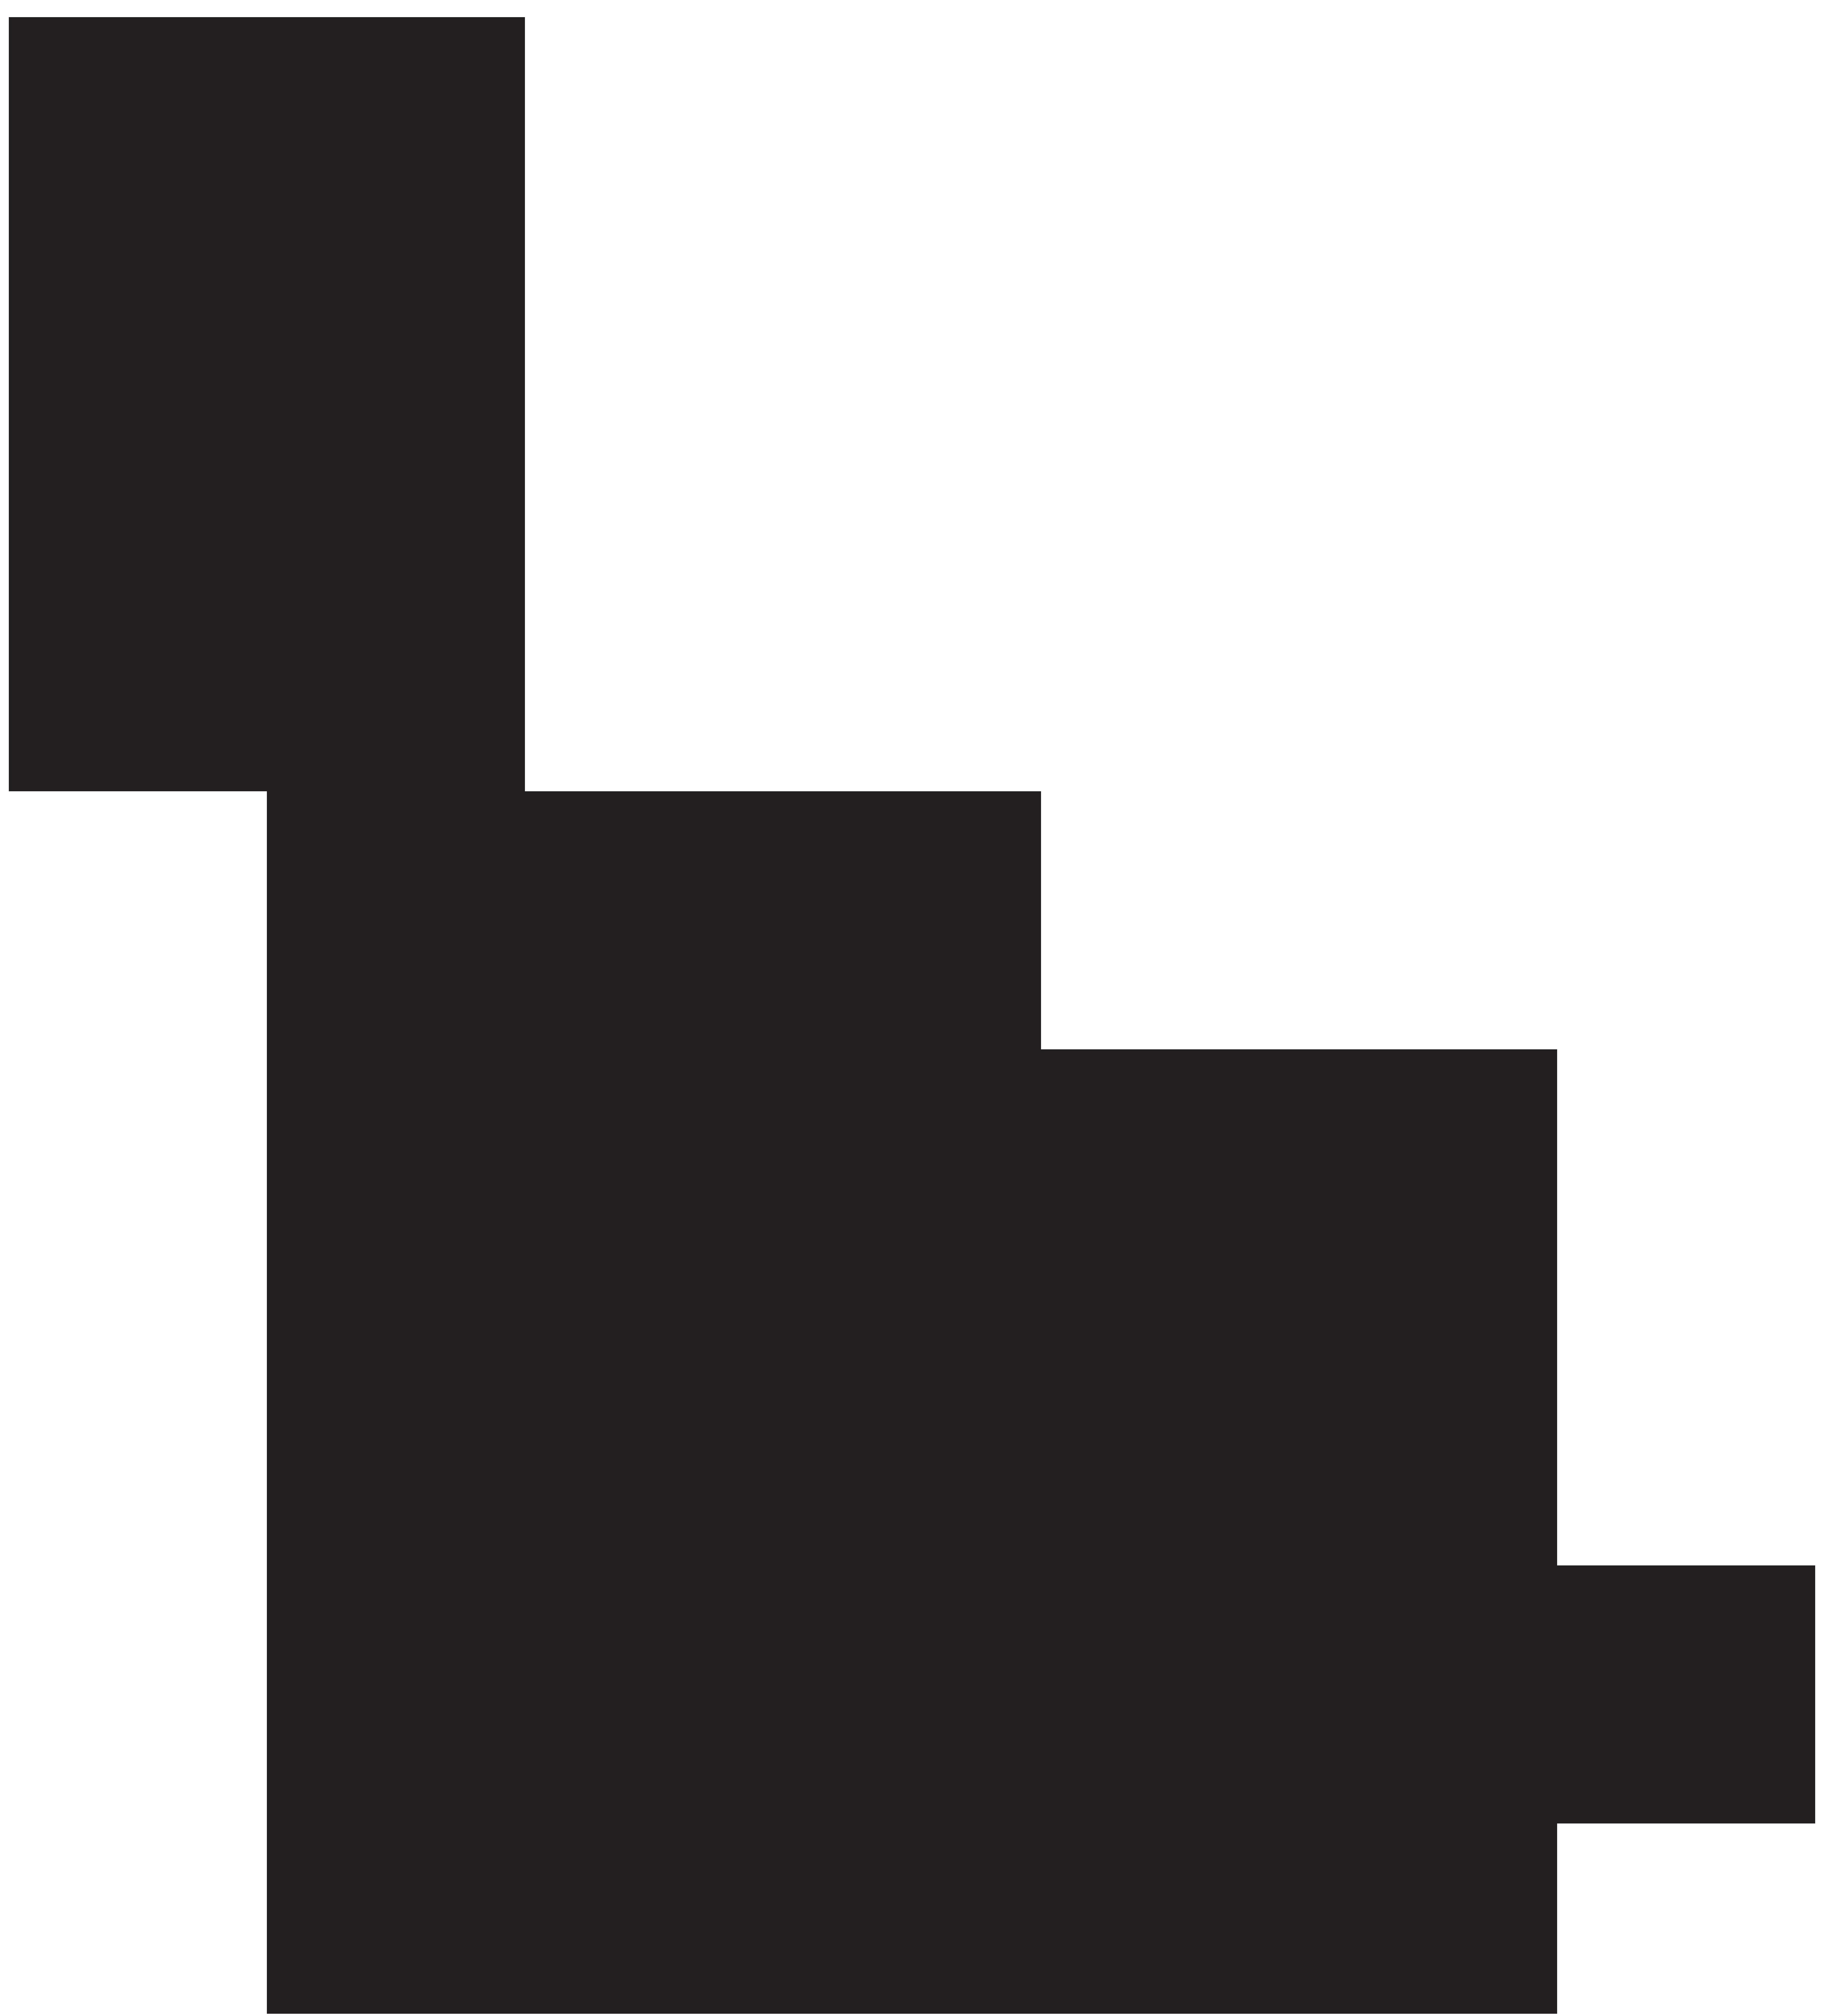 Dinosaur silhouette clipart jpg transparent stock Dinosaur Silhouette PNG Clip Art Image   Gallery ... jpg transparent stock